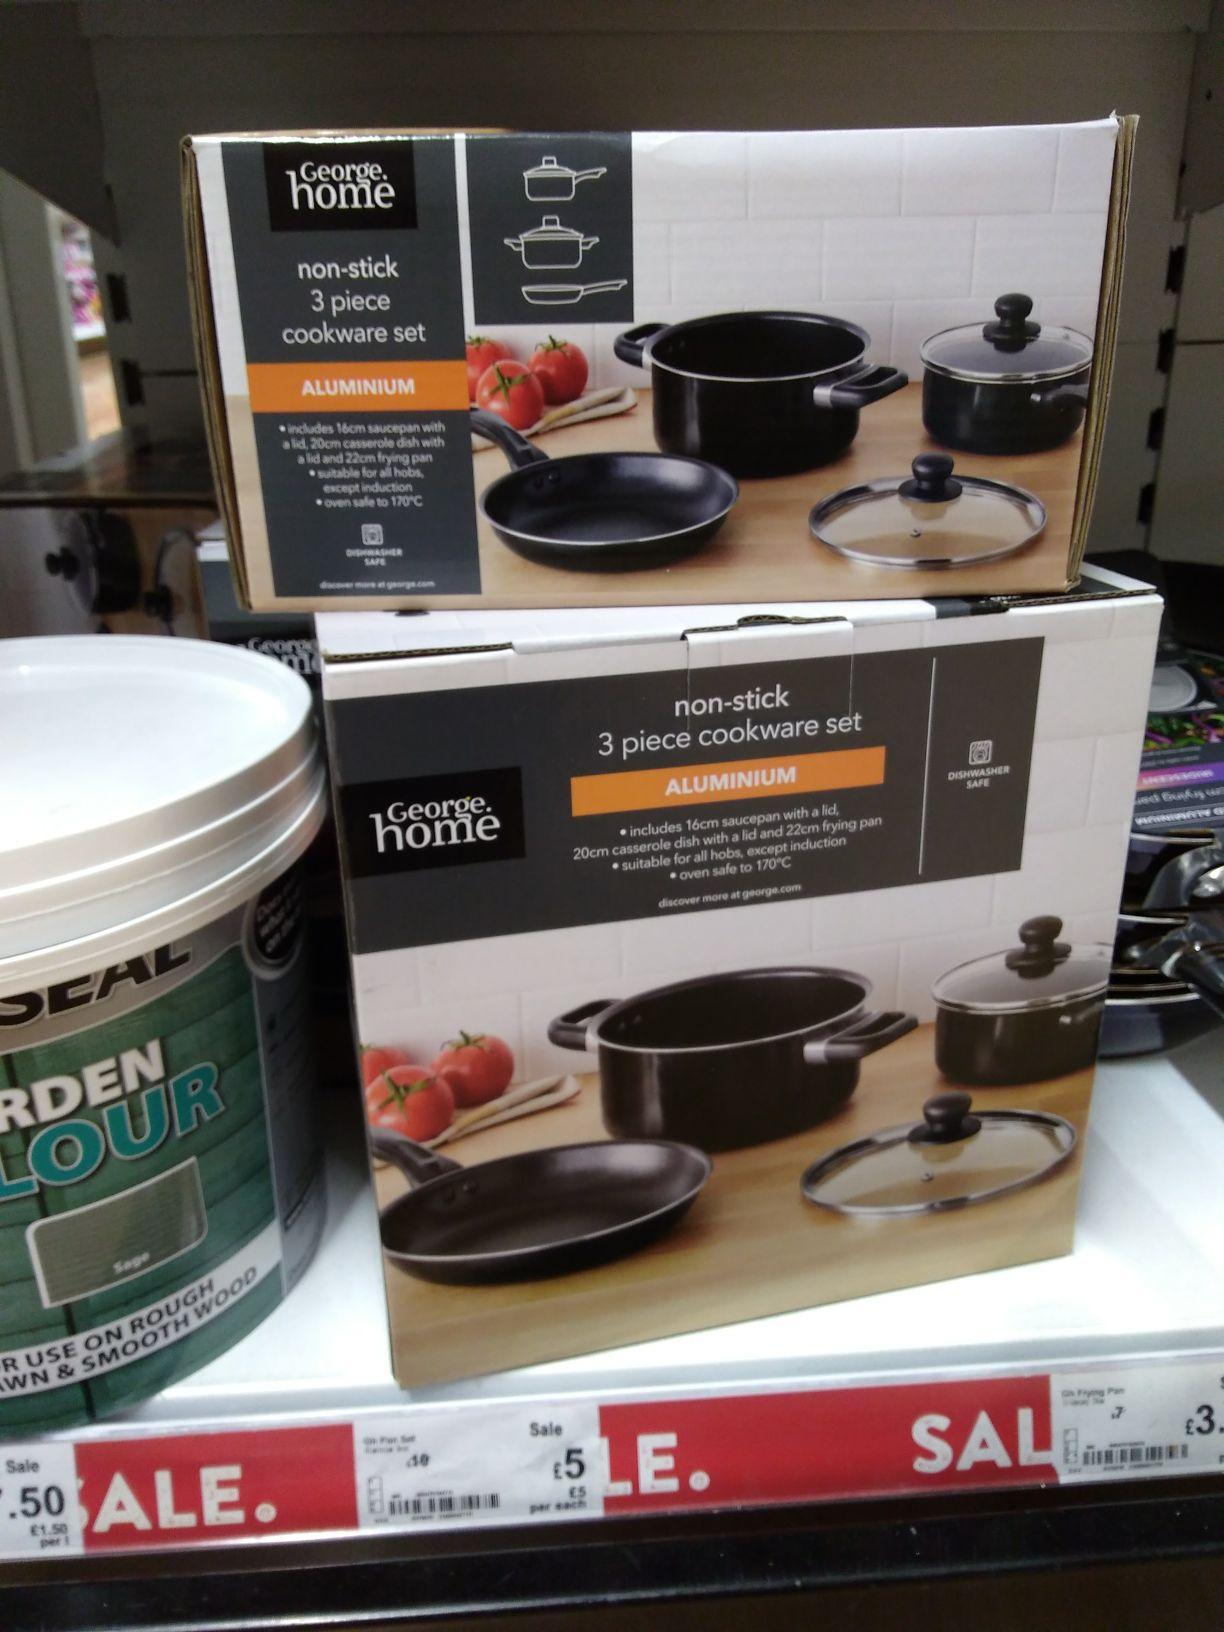 George Home 3-piece Aluminium Oven Safe Cookware Set was £10 now £5 @ Asda